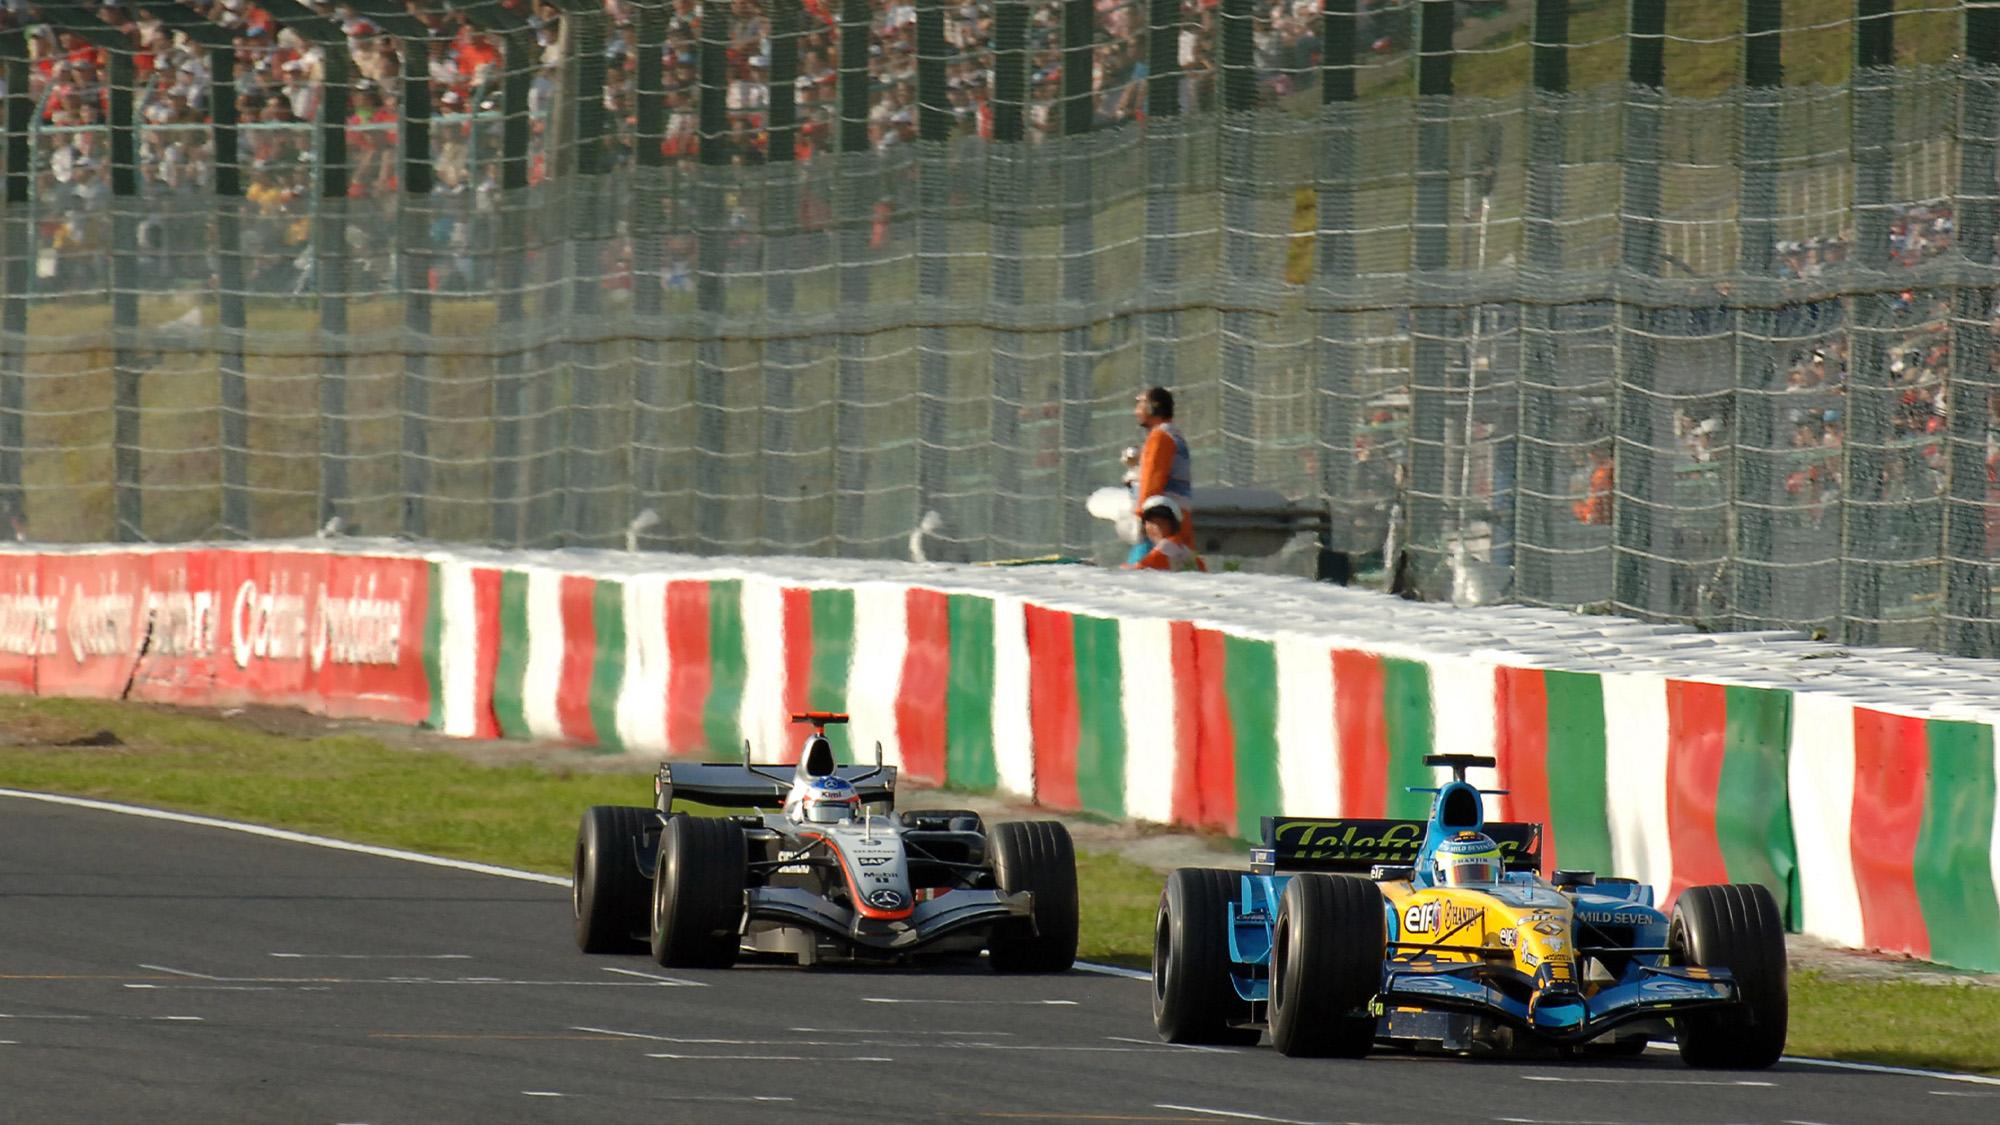 Kimi Raikkonen follows Giancarlo Fisichella in the Benetton during the 2005 Japanese Grand Prix at Suzuka